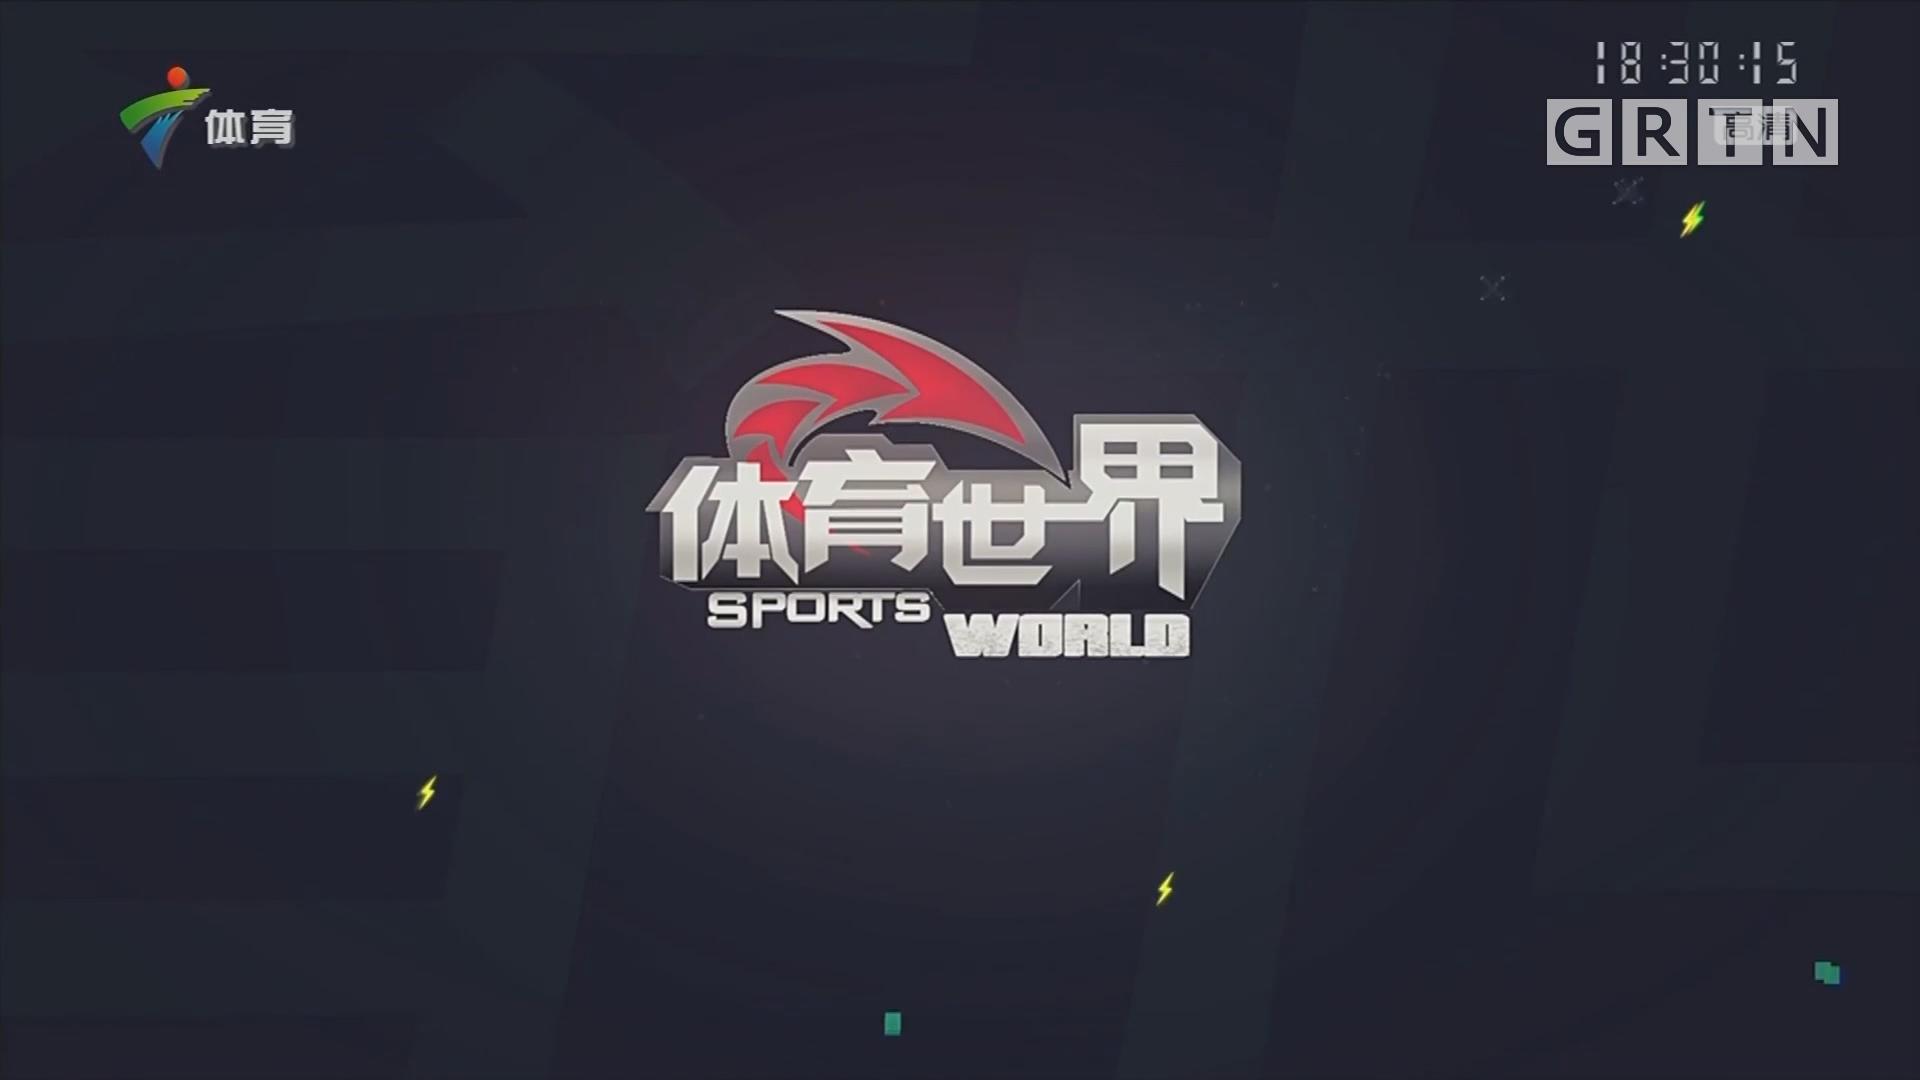 [HD][2019-02-26]体育世界:中国乒乓球队新一届教练组名单公布